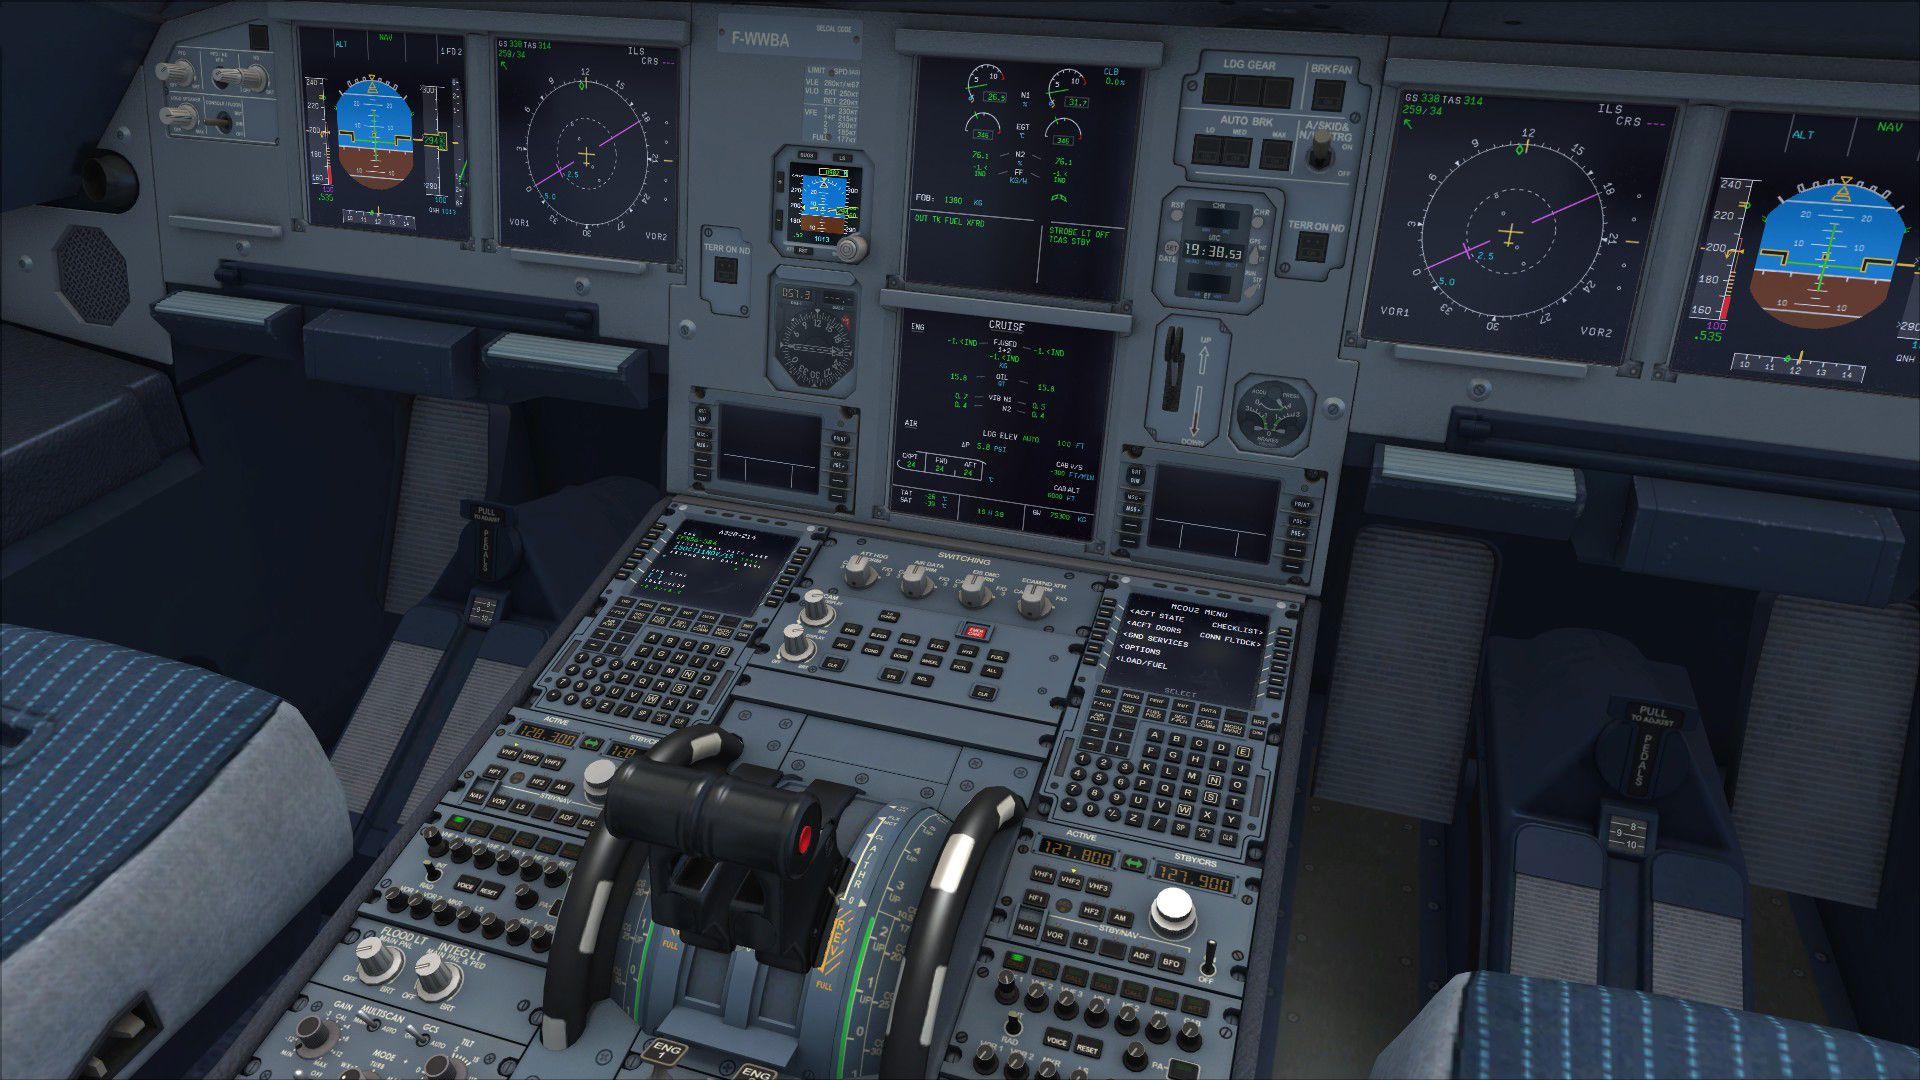 A3183196